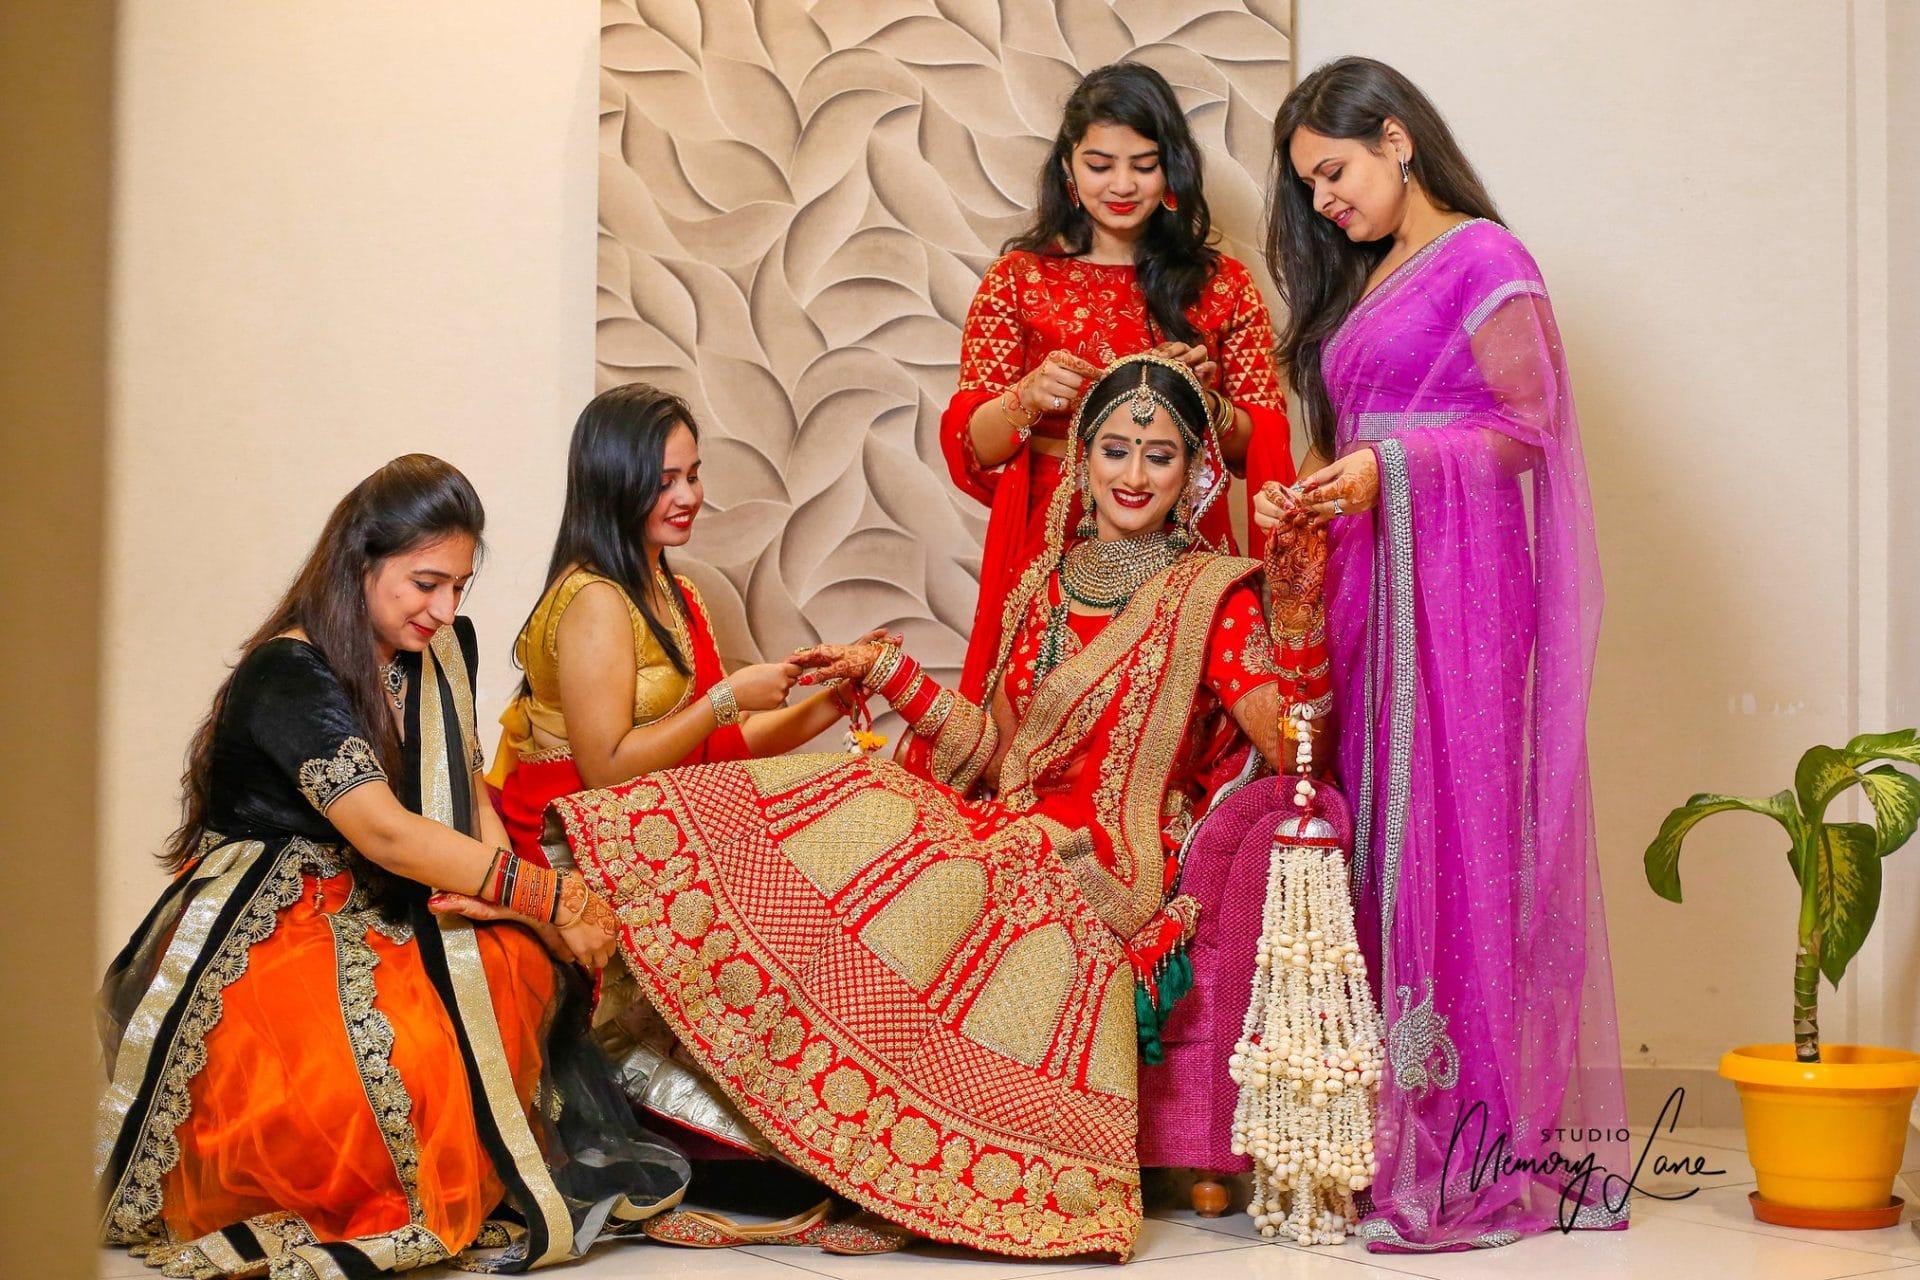 Bride's maid | Professional wedding photography Punjab